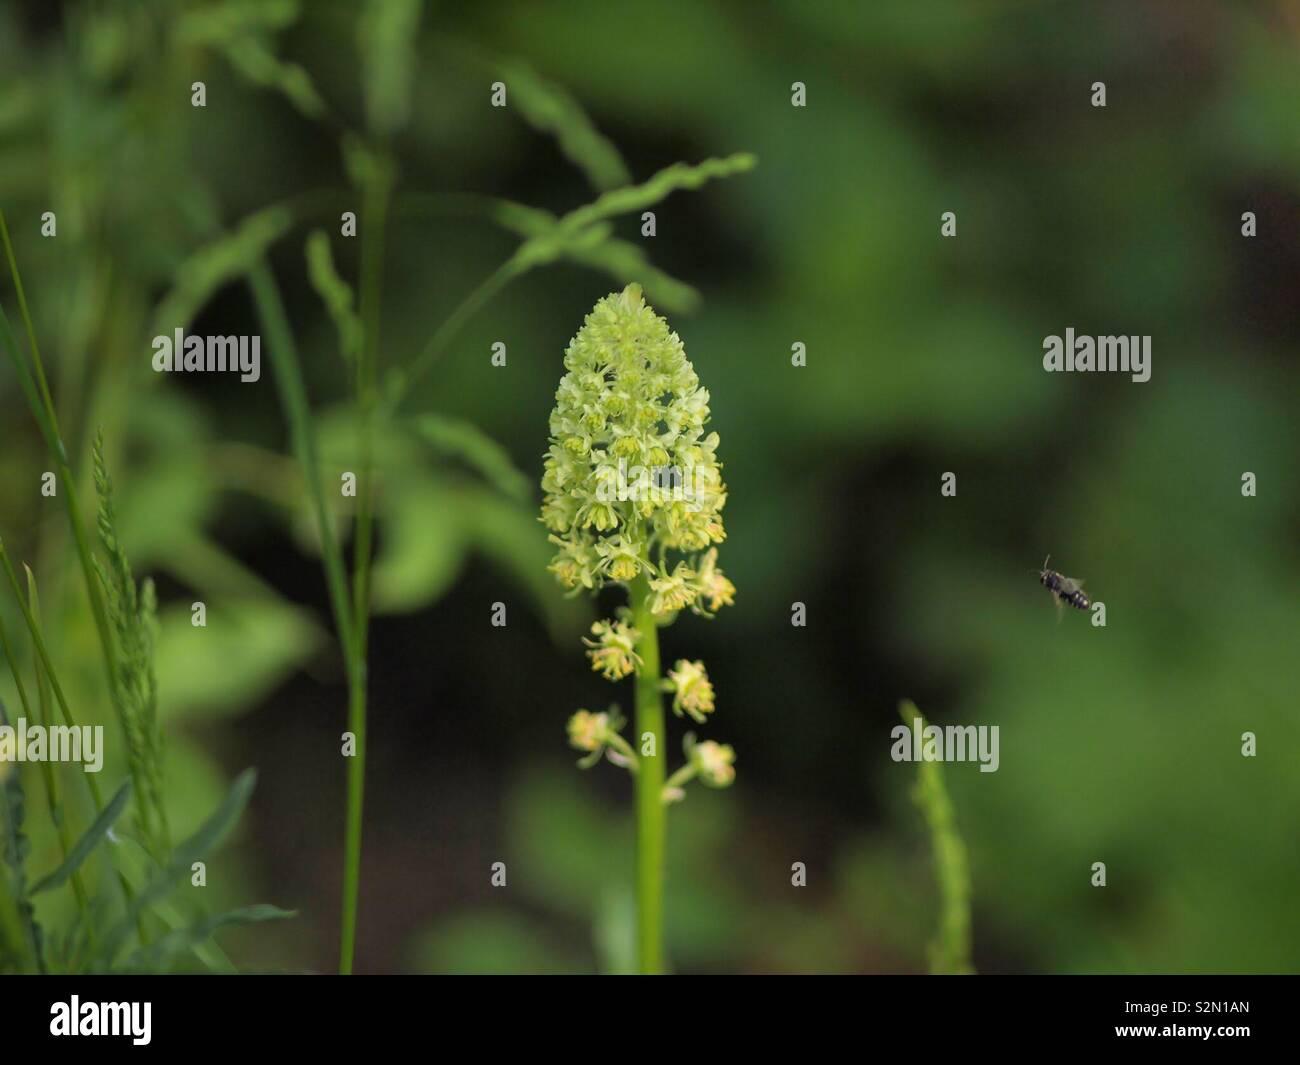 Wiesenblume mit Insekt im Anflug - Stock Image